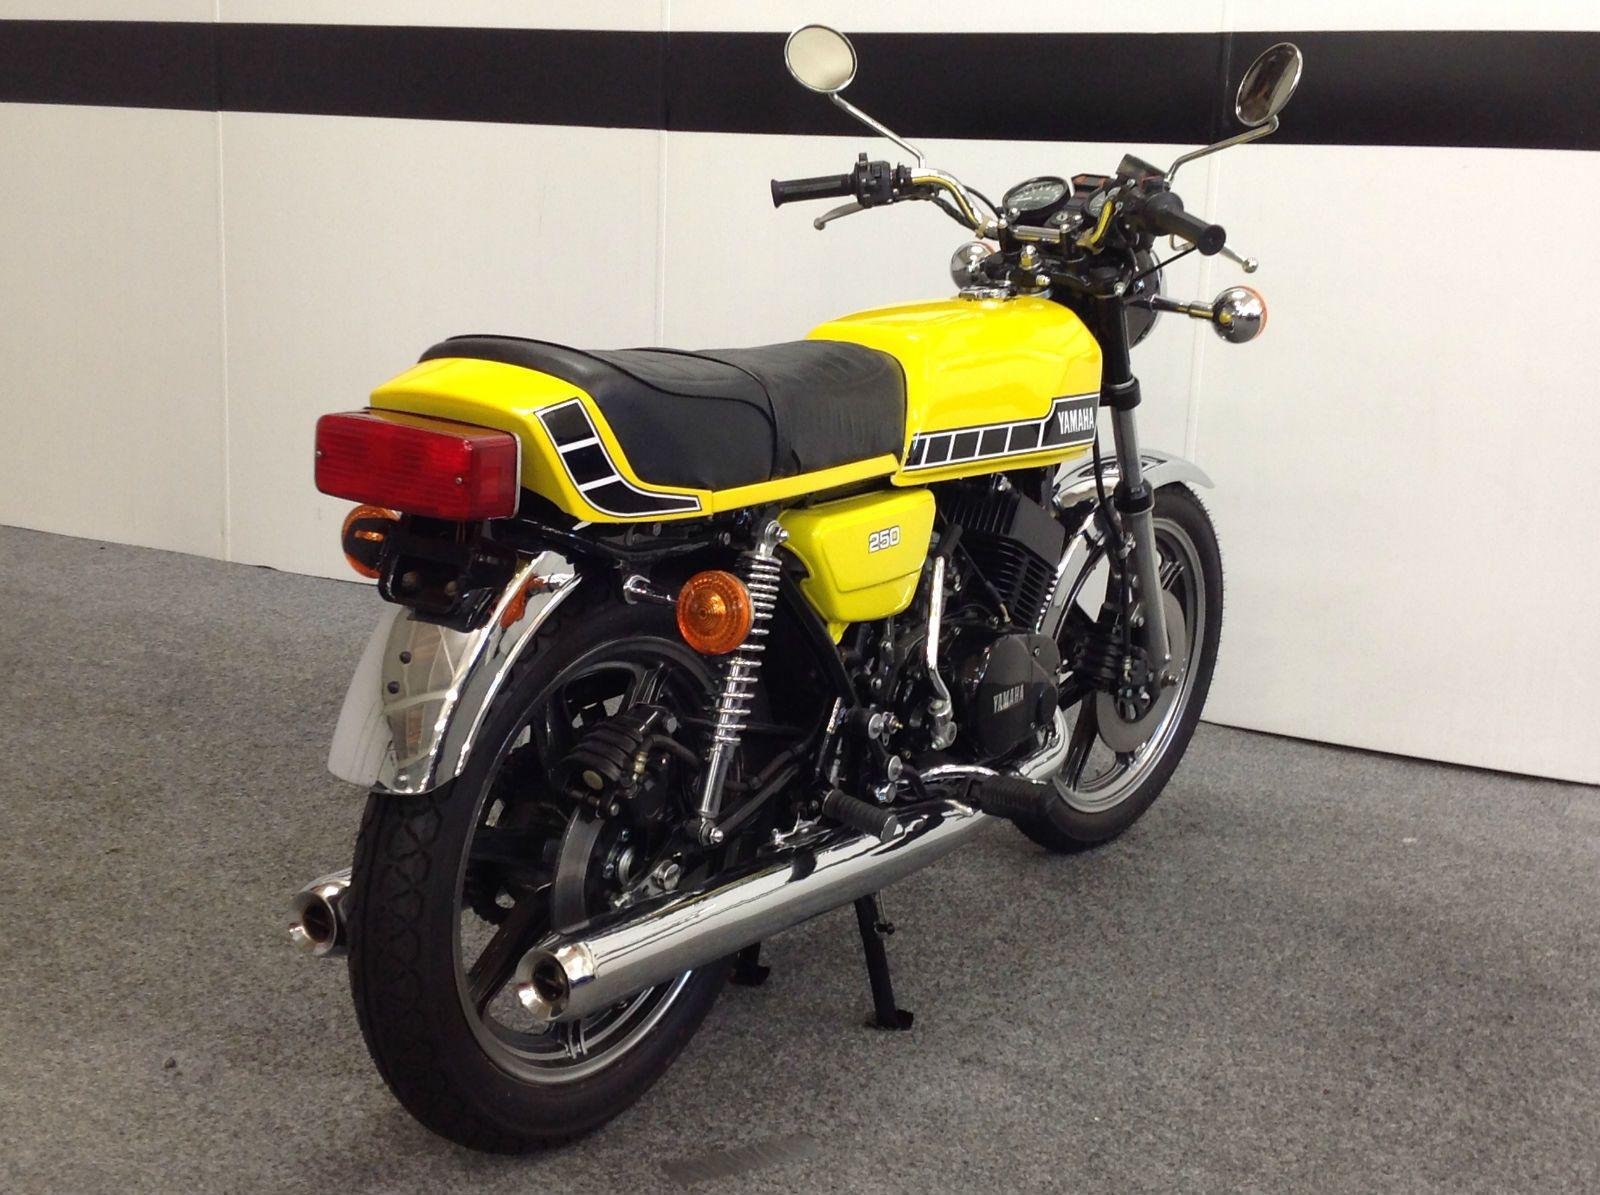 1979 Yamaha RD 250 Professional Rebuild   eBay   Motorcycles